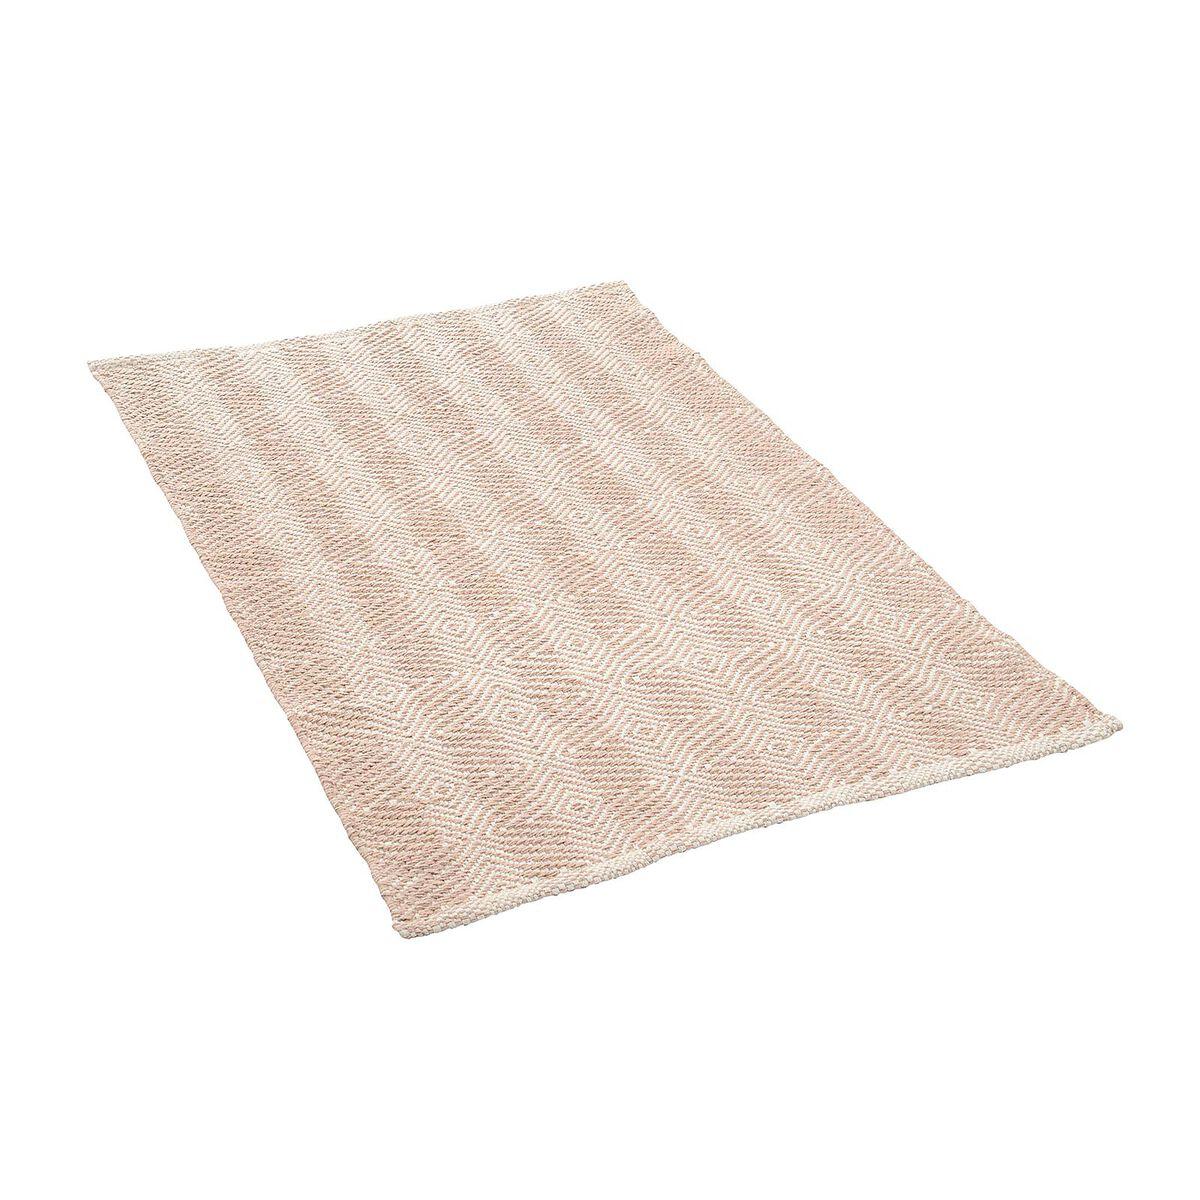 Teppich taupe ca B:60 x L:90 cm (100% Baumwolle) - Depot DE